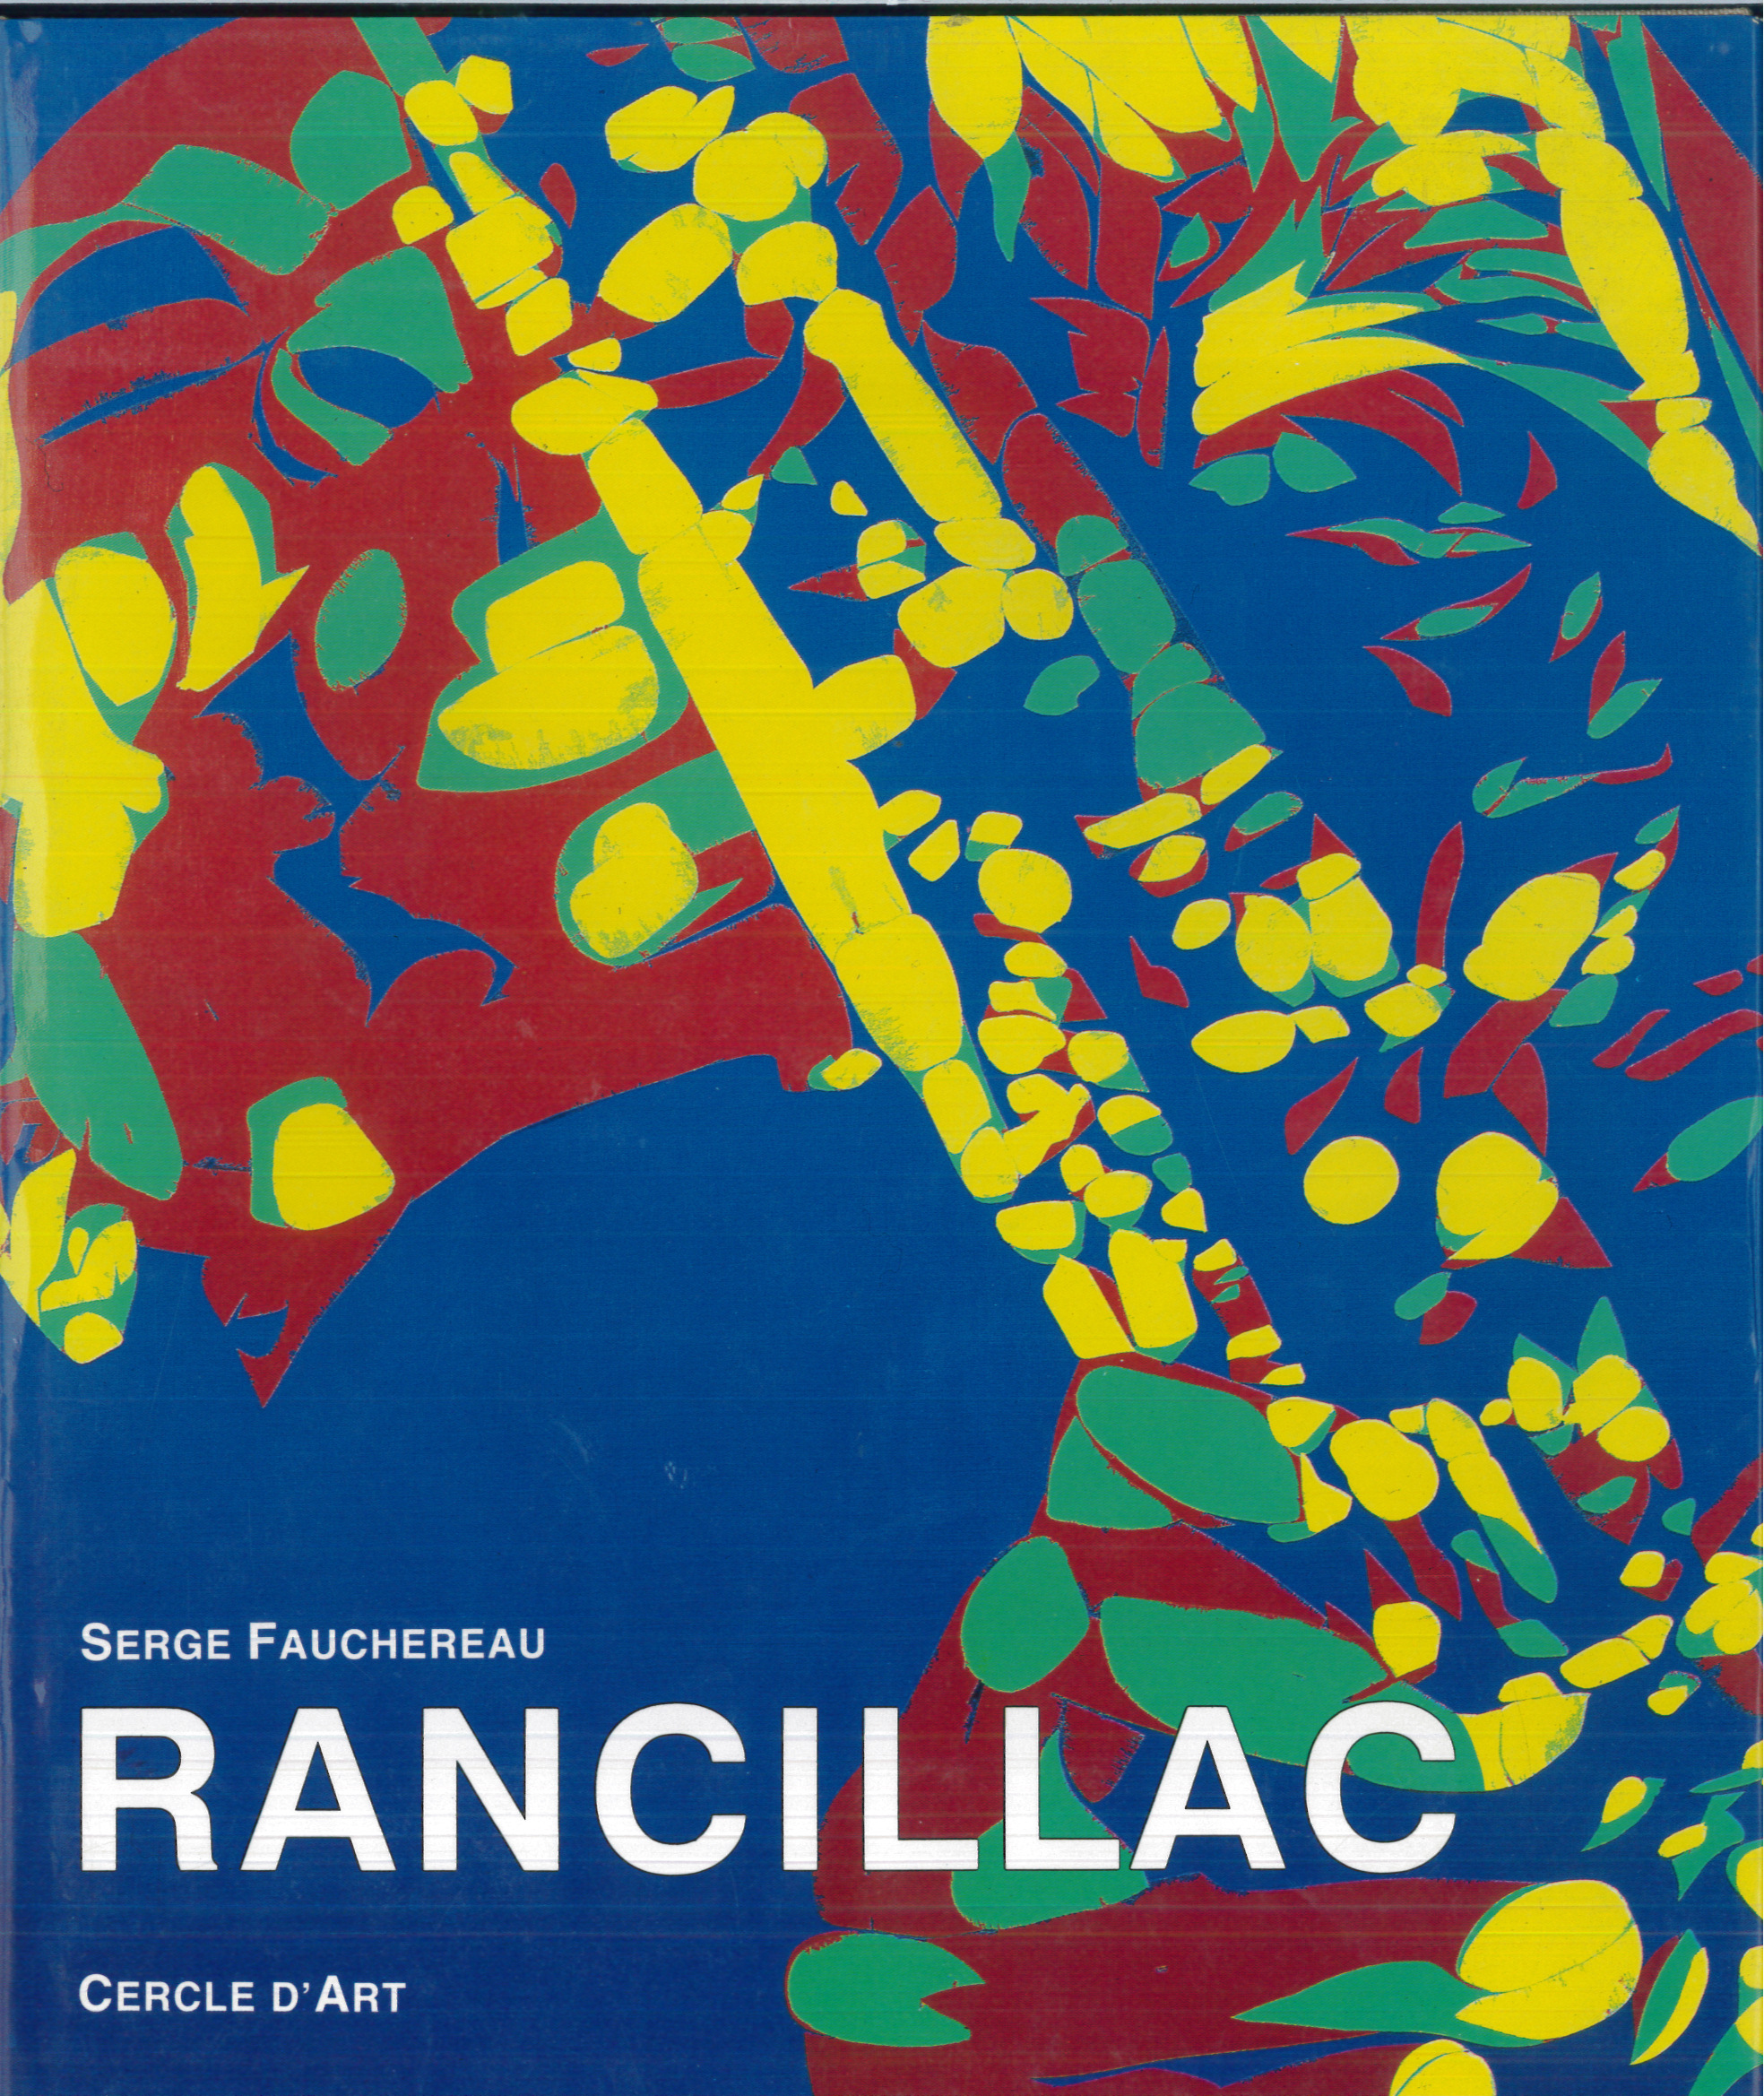 21-2-Serge-Fauchereau-Bernard-Rancillac-Paris-Cercle-d-Art-1991